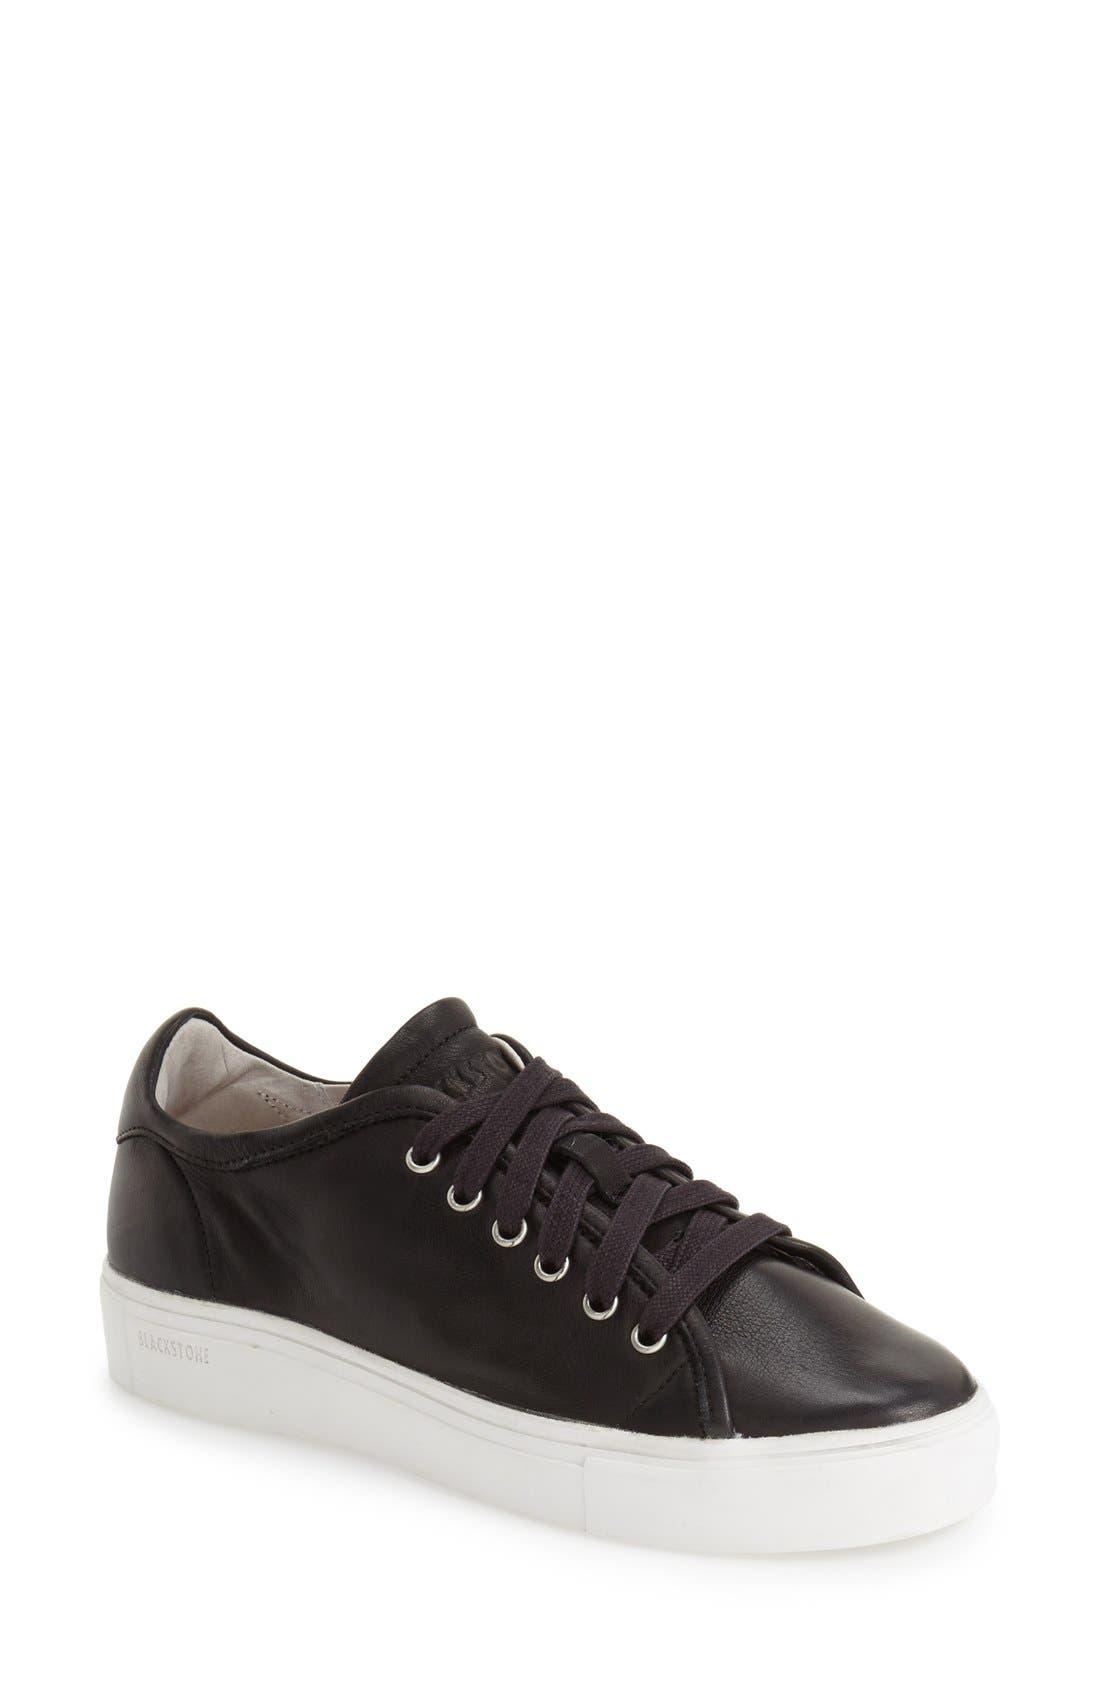 Alternate Image 1 Selected - Blackstone 'LL64' Sneaker (Women)